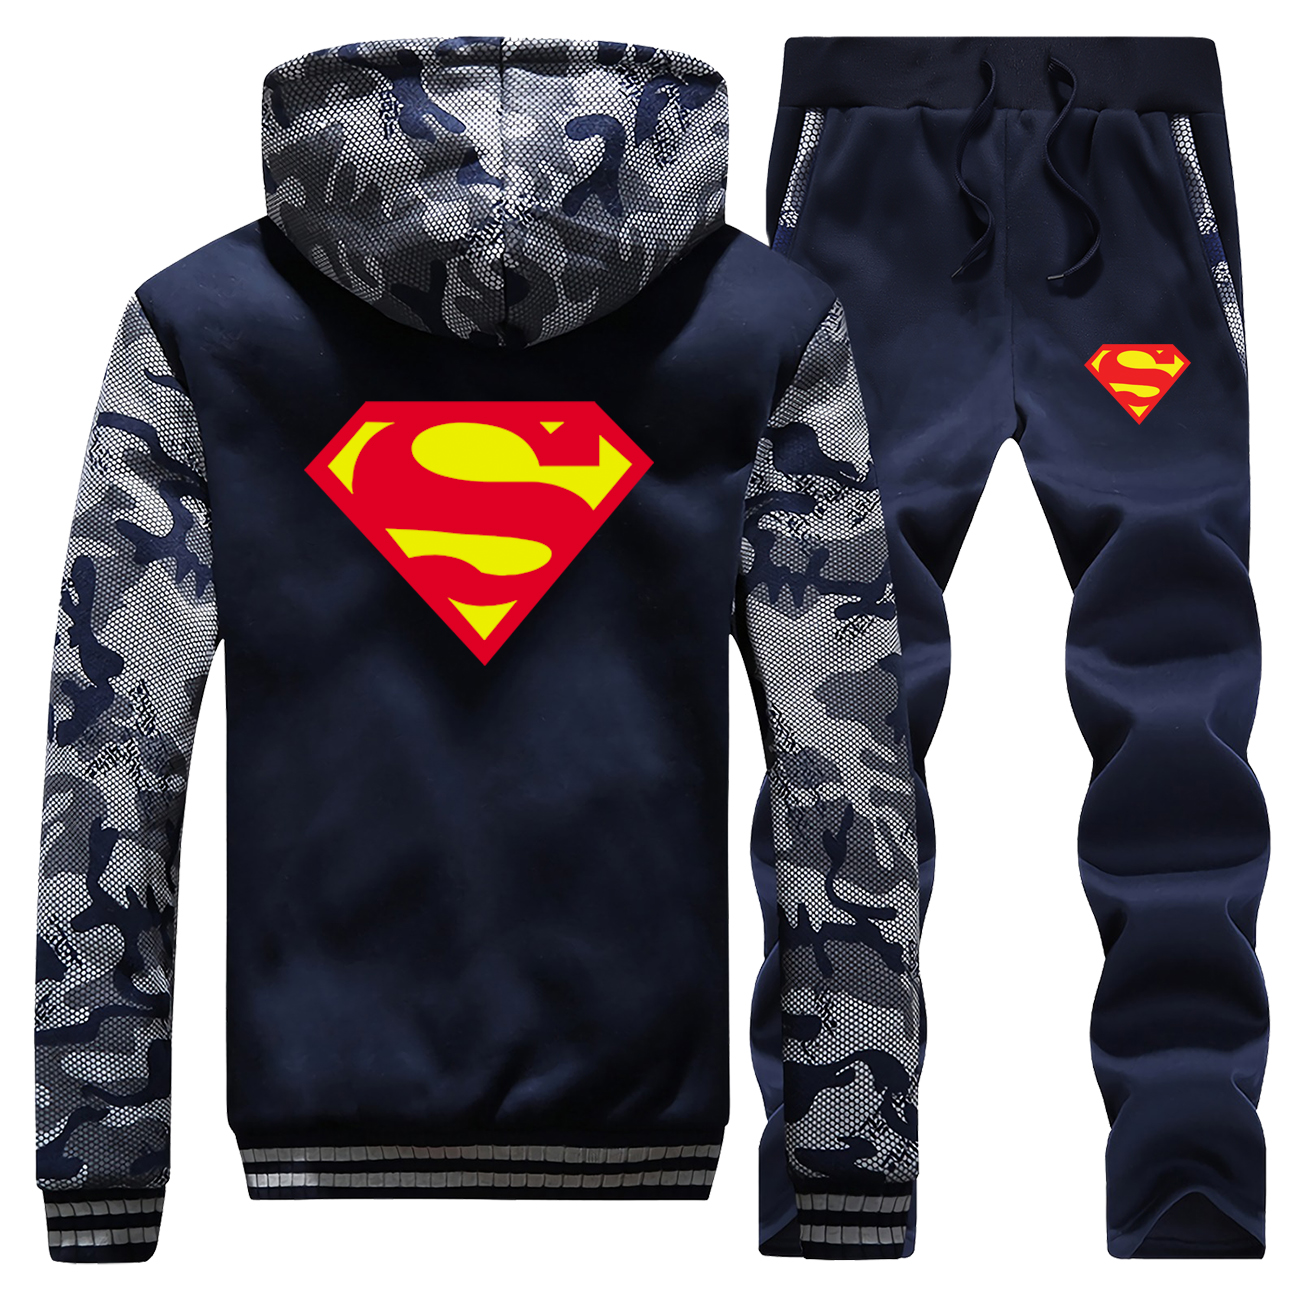 Winter Jacket+Pant 2PC Set Men Supreman Camouflage Sweatshirt Men Fashion Coat Thick Tracksuit Mens Hoodies Warm Suit Sportswear